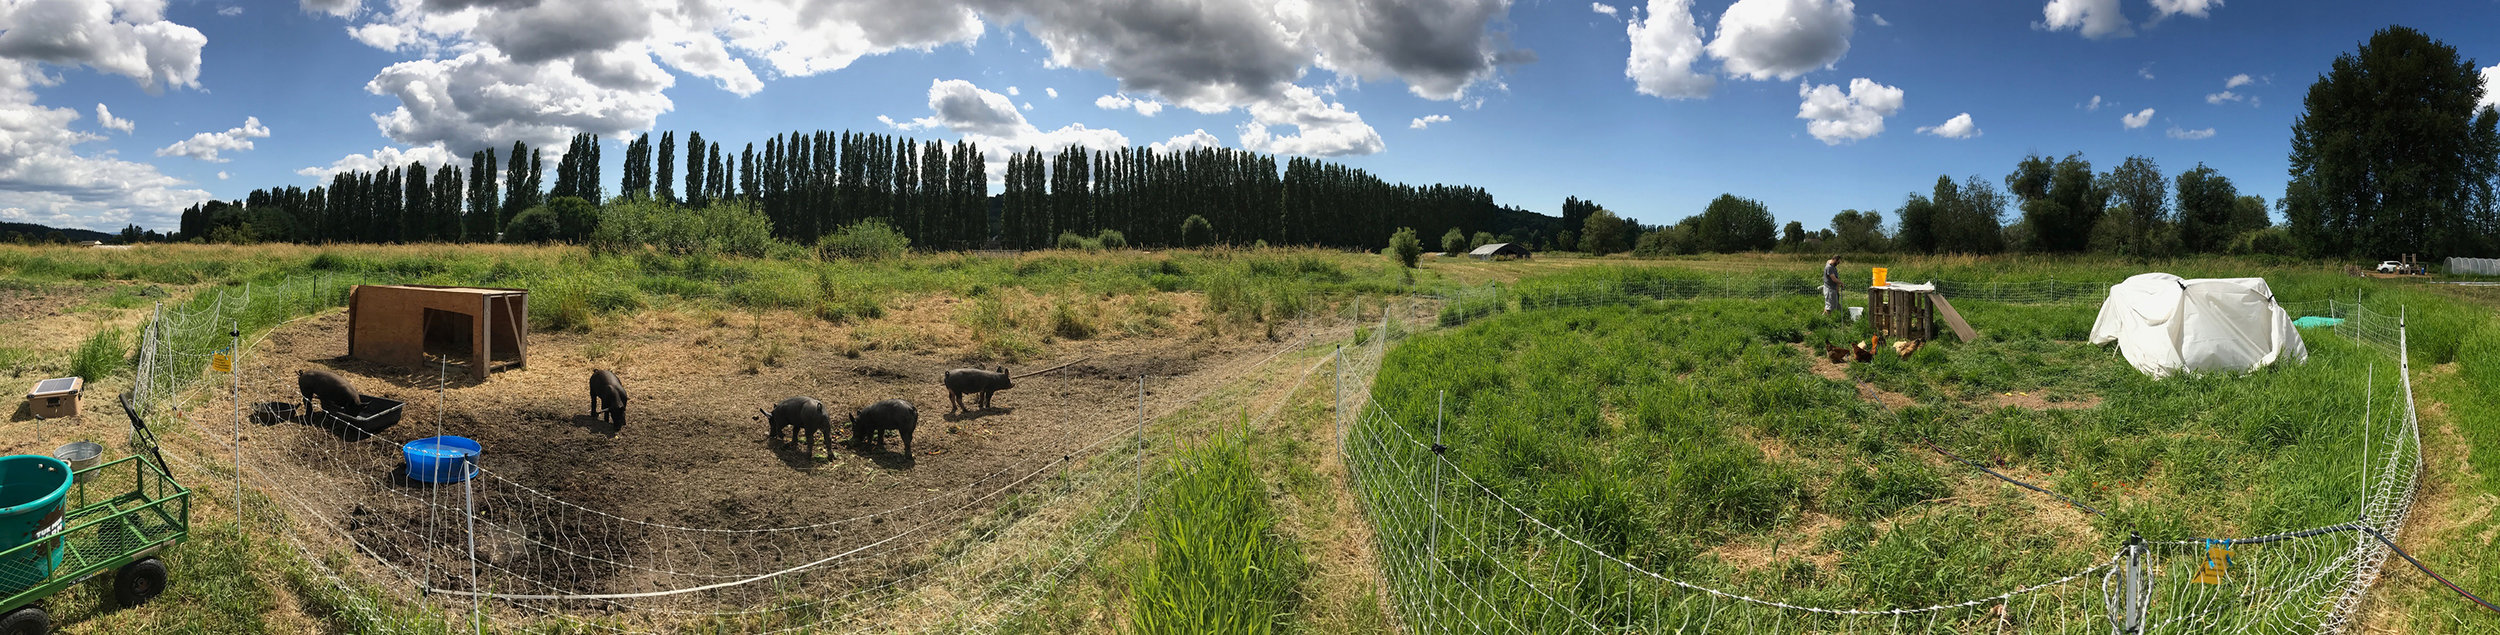 farm-panoramic-crop-2-800pxH.jpg